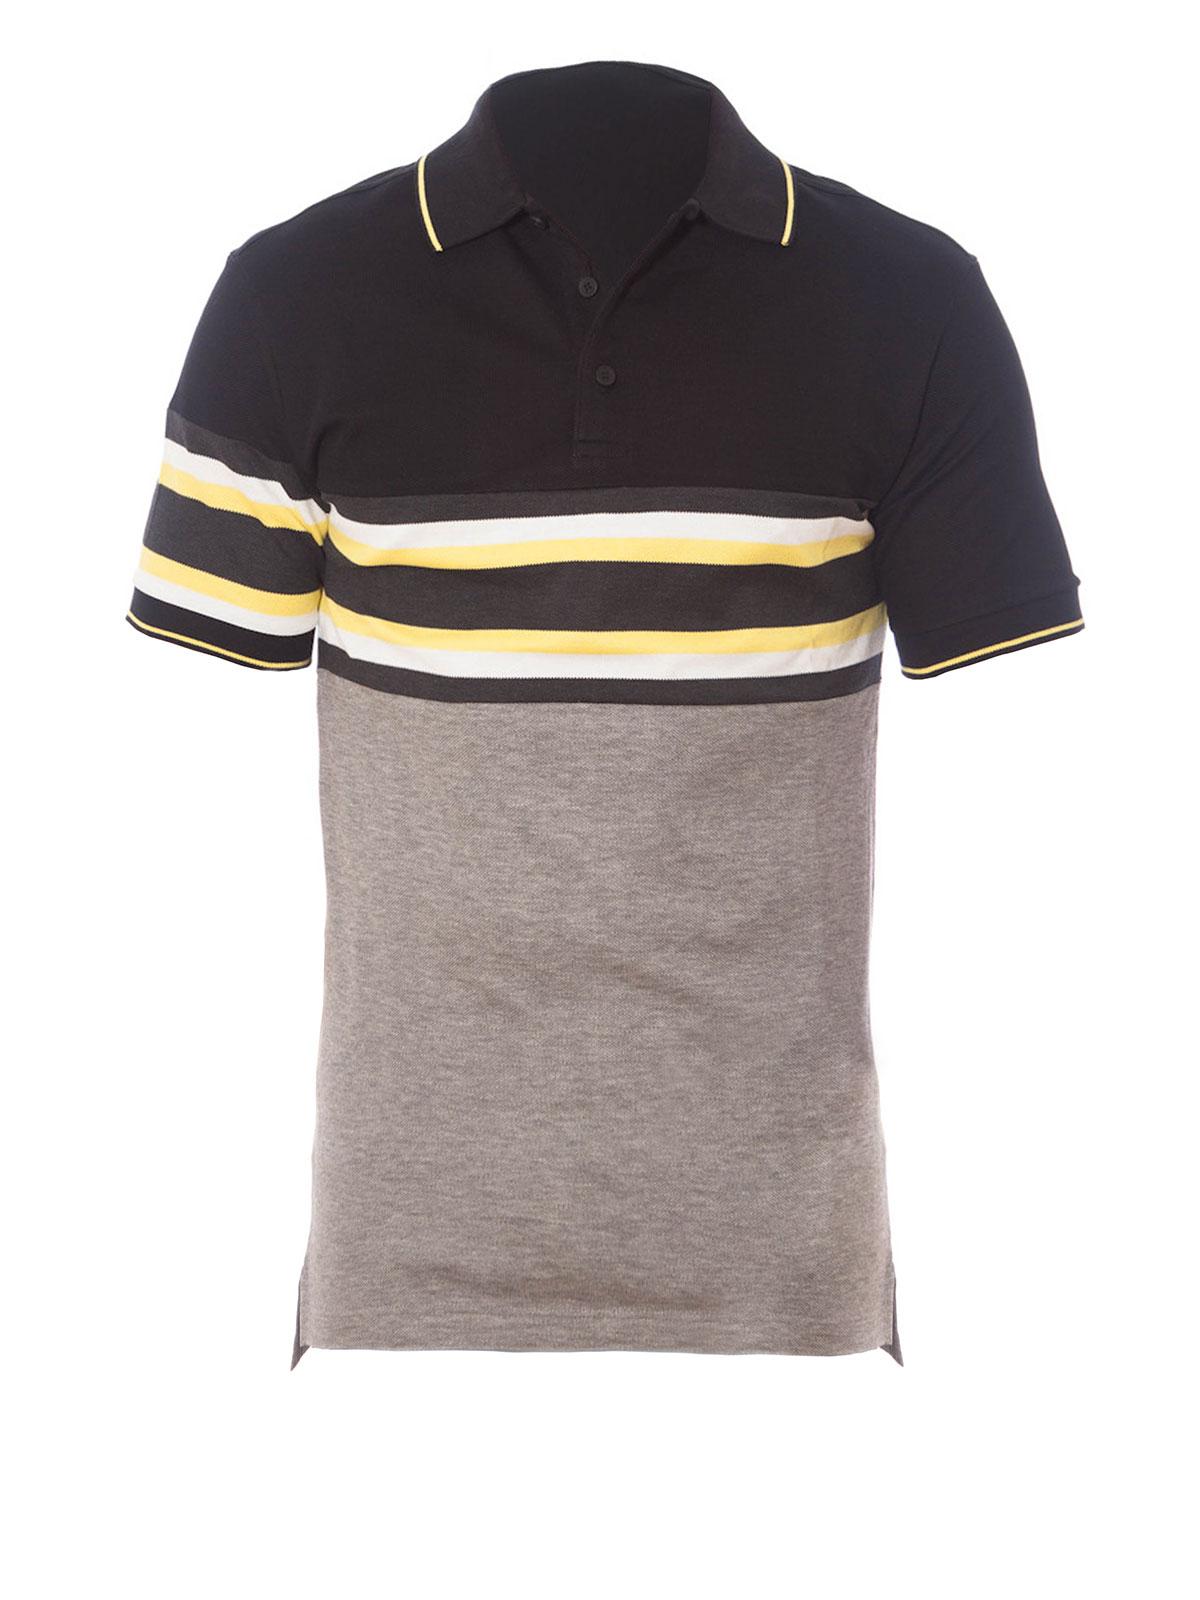 a91f6bb3 Givenchy - Striped detail polo - polo shirts - 16S7103-700 001 ...